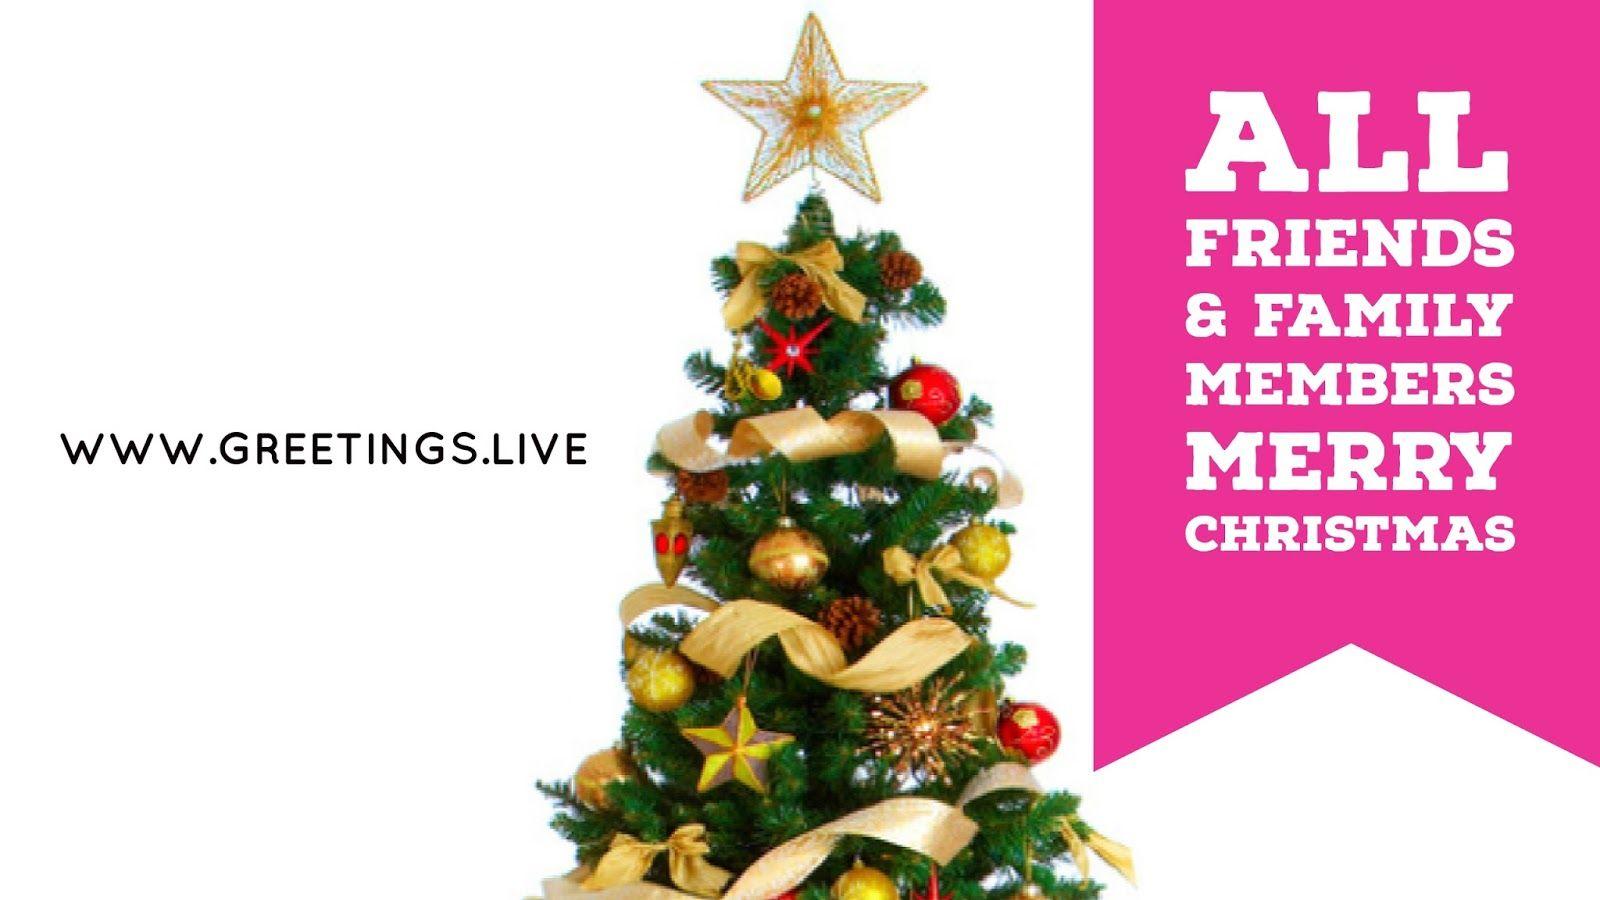 Latest English Greetings On Christmas Festival Greetings Live